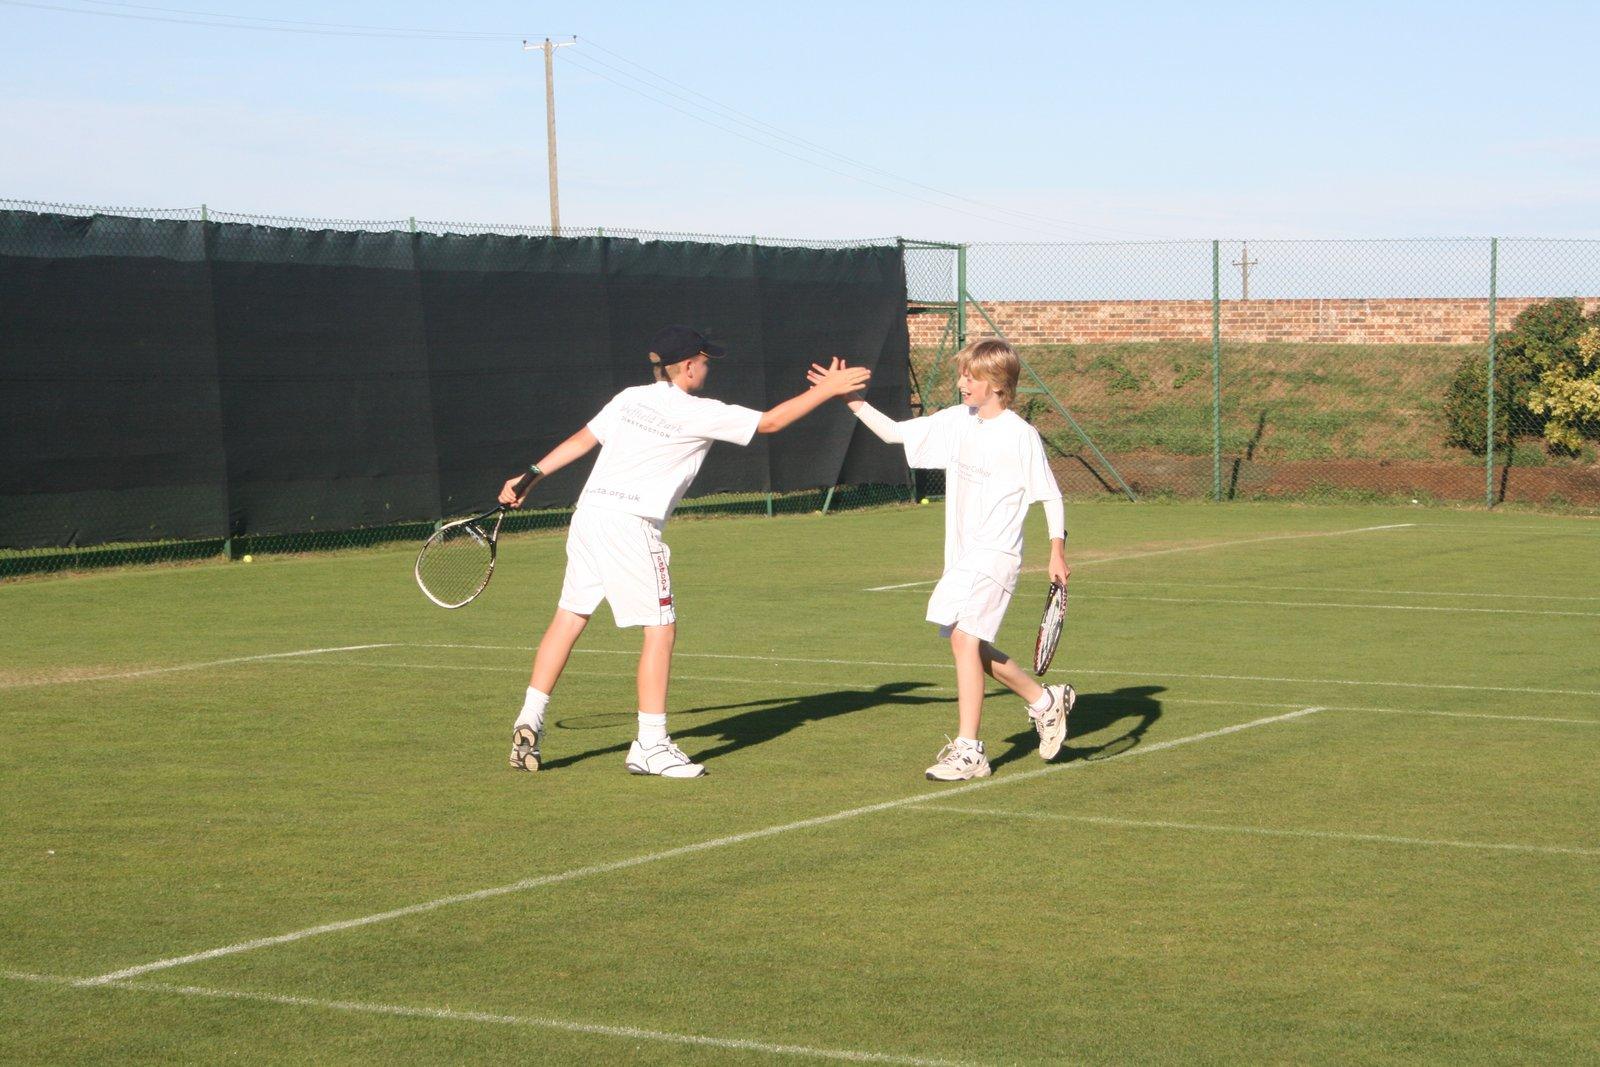 http://www.ryetennisandsquashclub.org.uk/wp-content/uploads/2019/05/Tennis-303.jpg